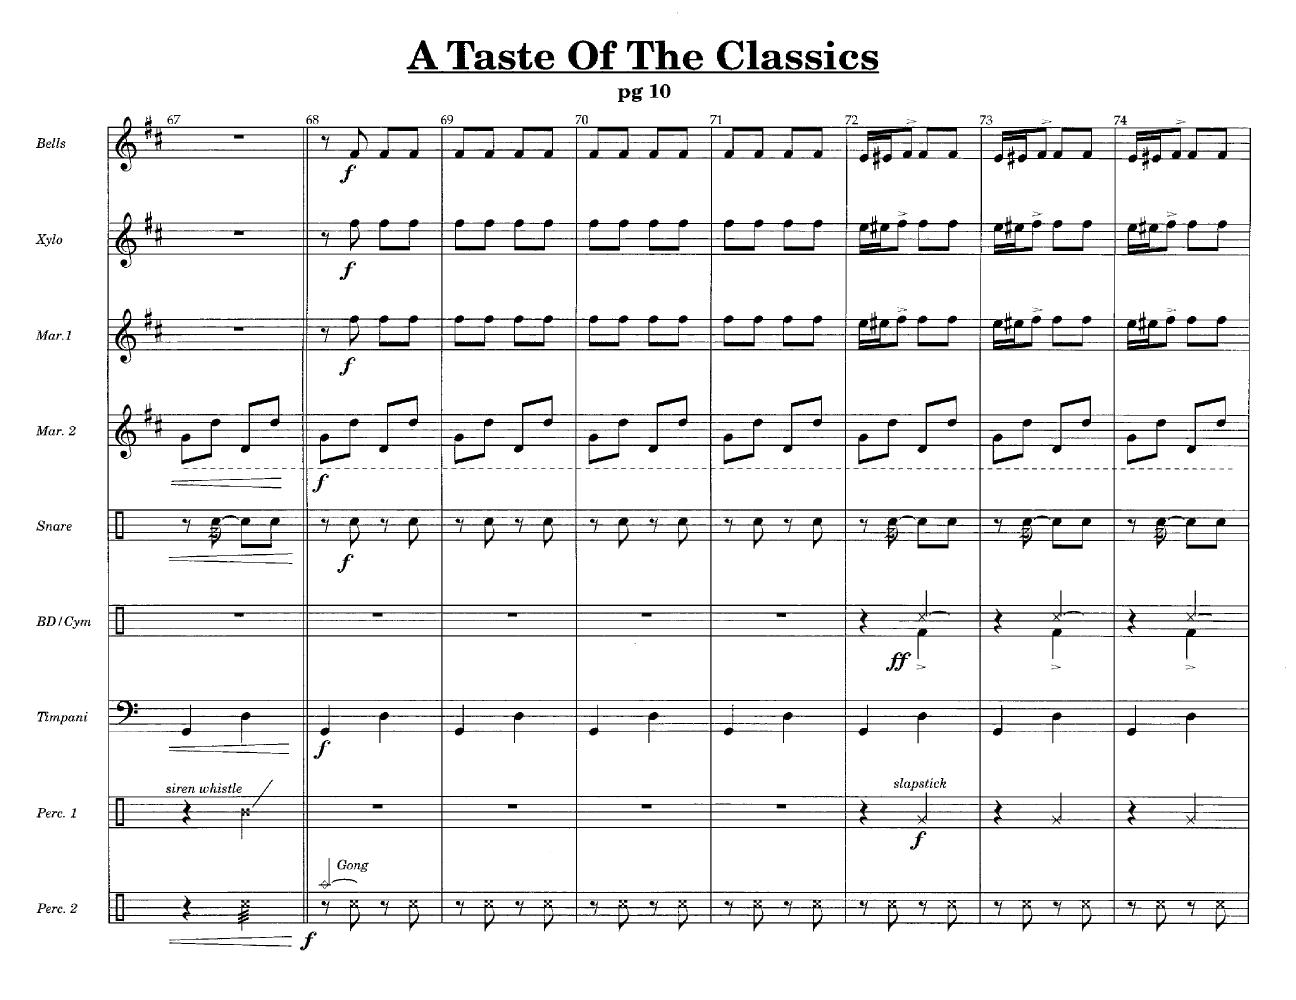 A Taste of the Classics Thumbnail